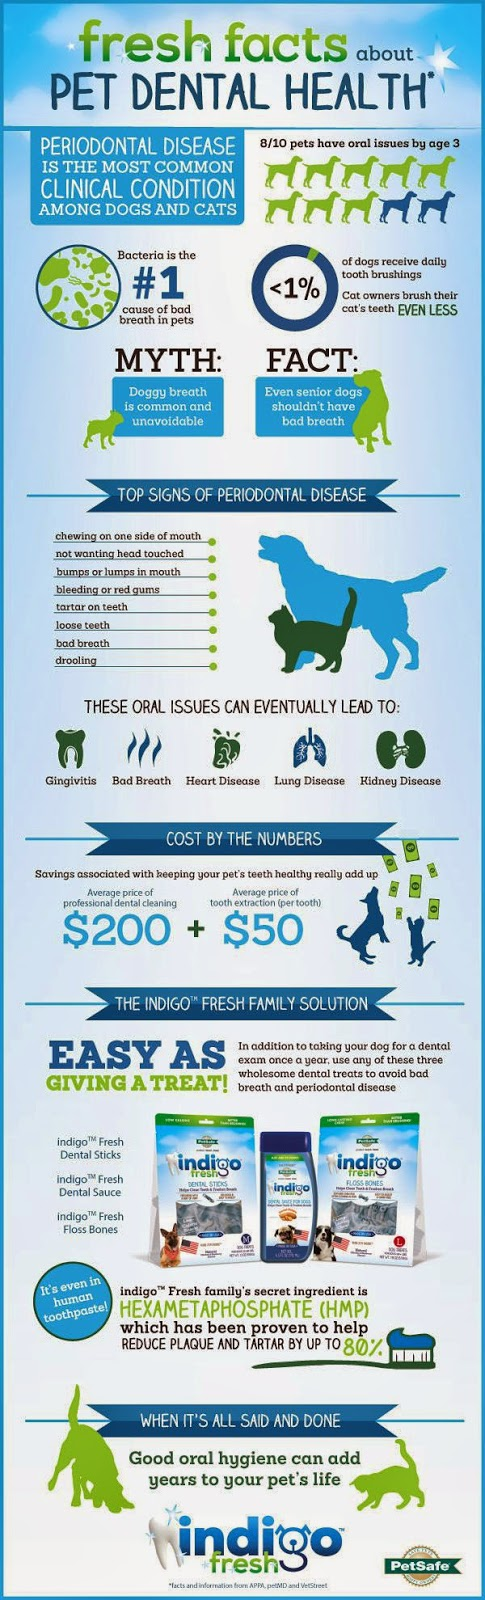 PetSafe Pet Dental Health Month infographic